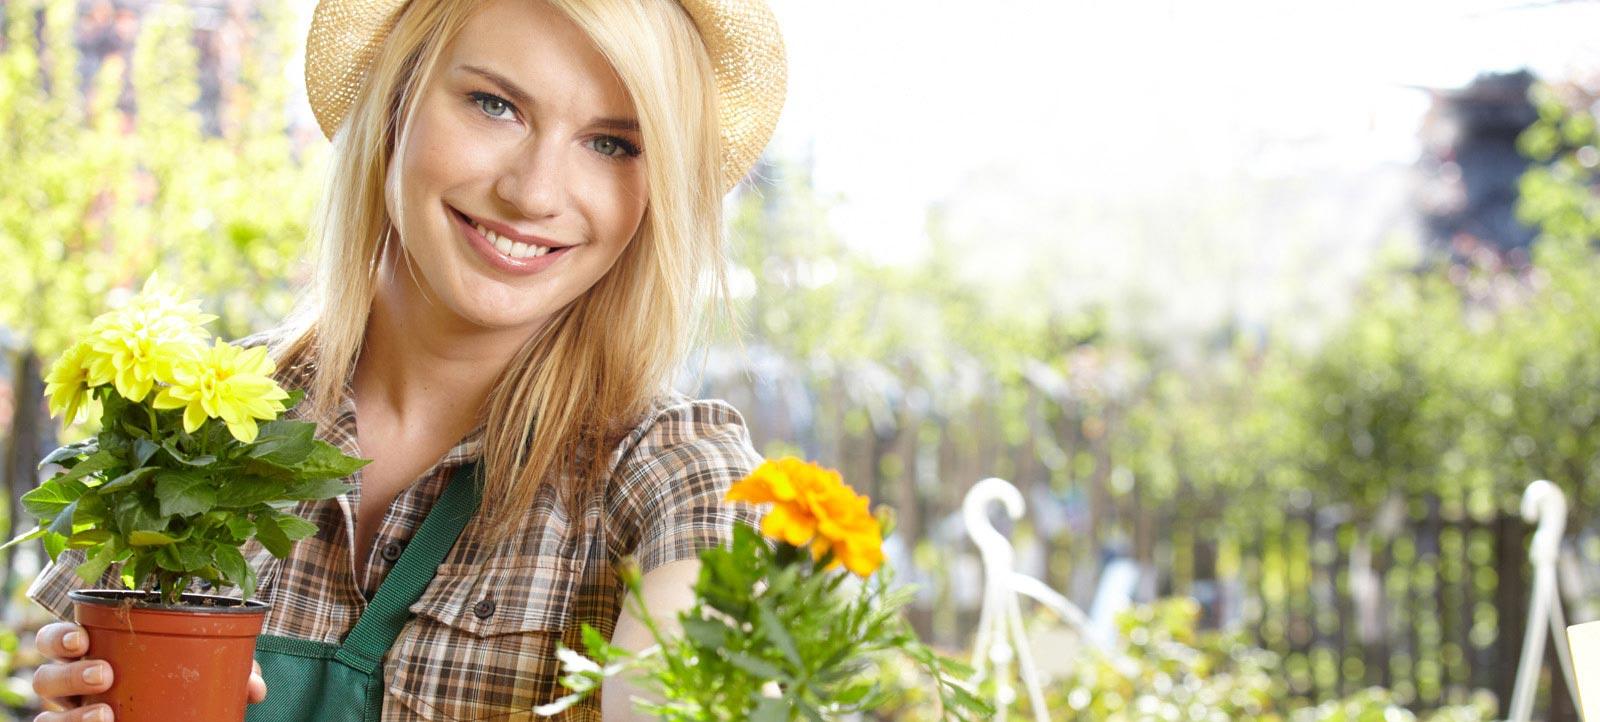 Femme souriante avec fleurs